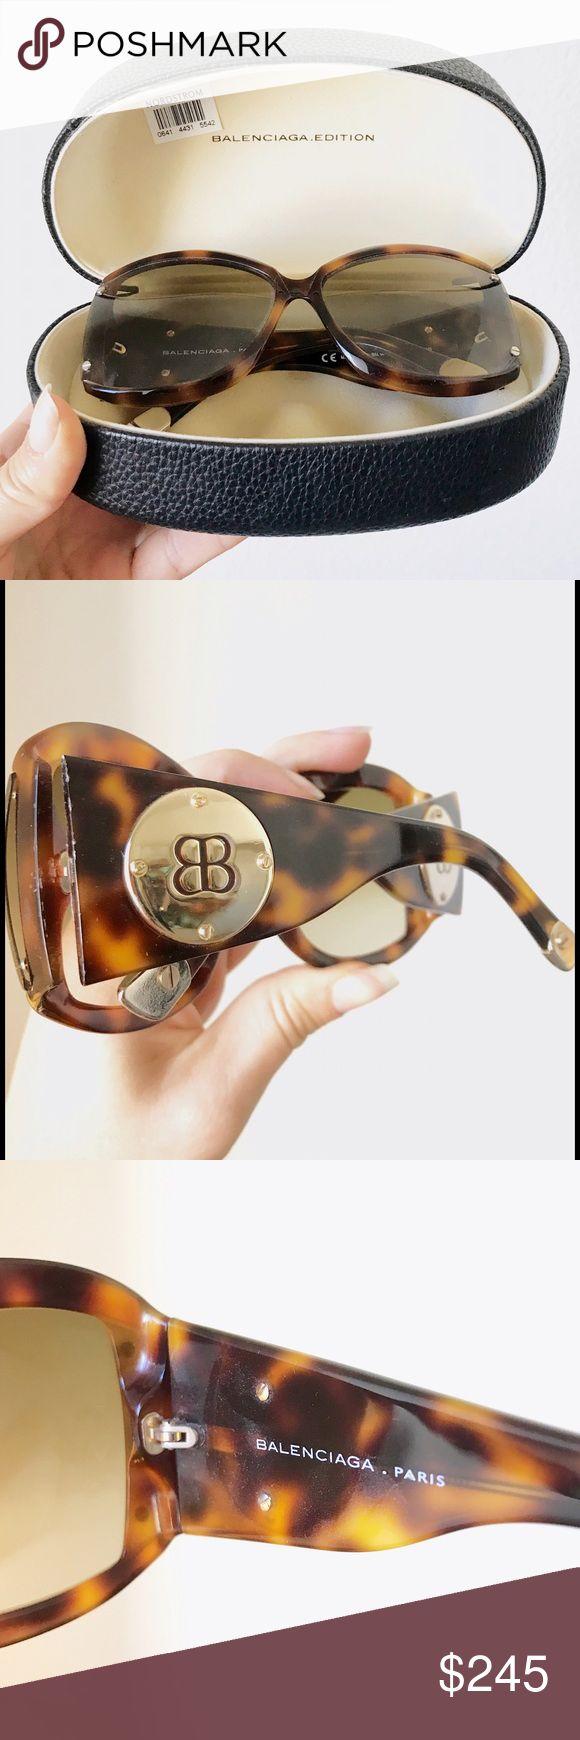 Balenciaga Sunglasses Amazing, gently worn, Balenciaga sunglasses no longer sold in stores. Originally purchased from Nordstrom. Balenciaga Accessories Sunglasses